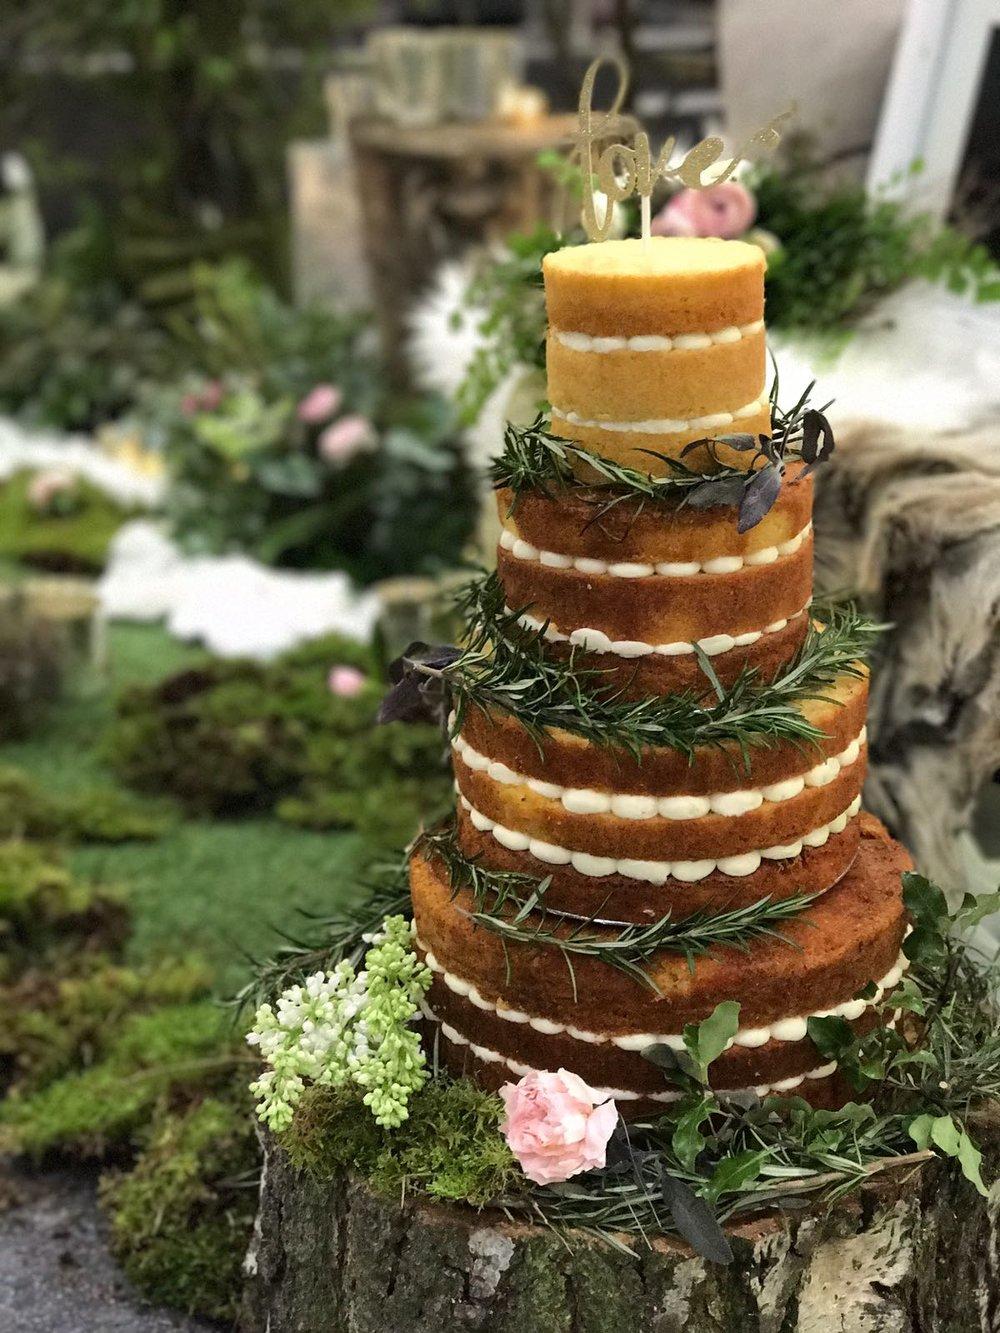 Cake by White Rose Cake Design hello@whiterosecakedesign.com Photo by Farm Styling (2).jpg